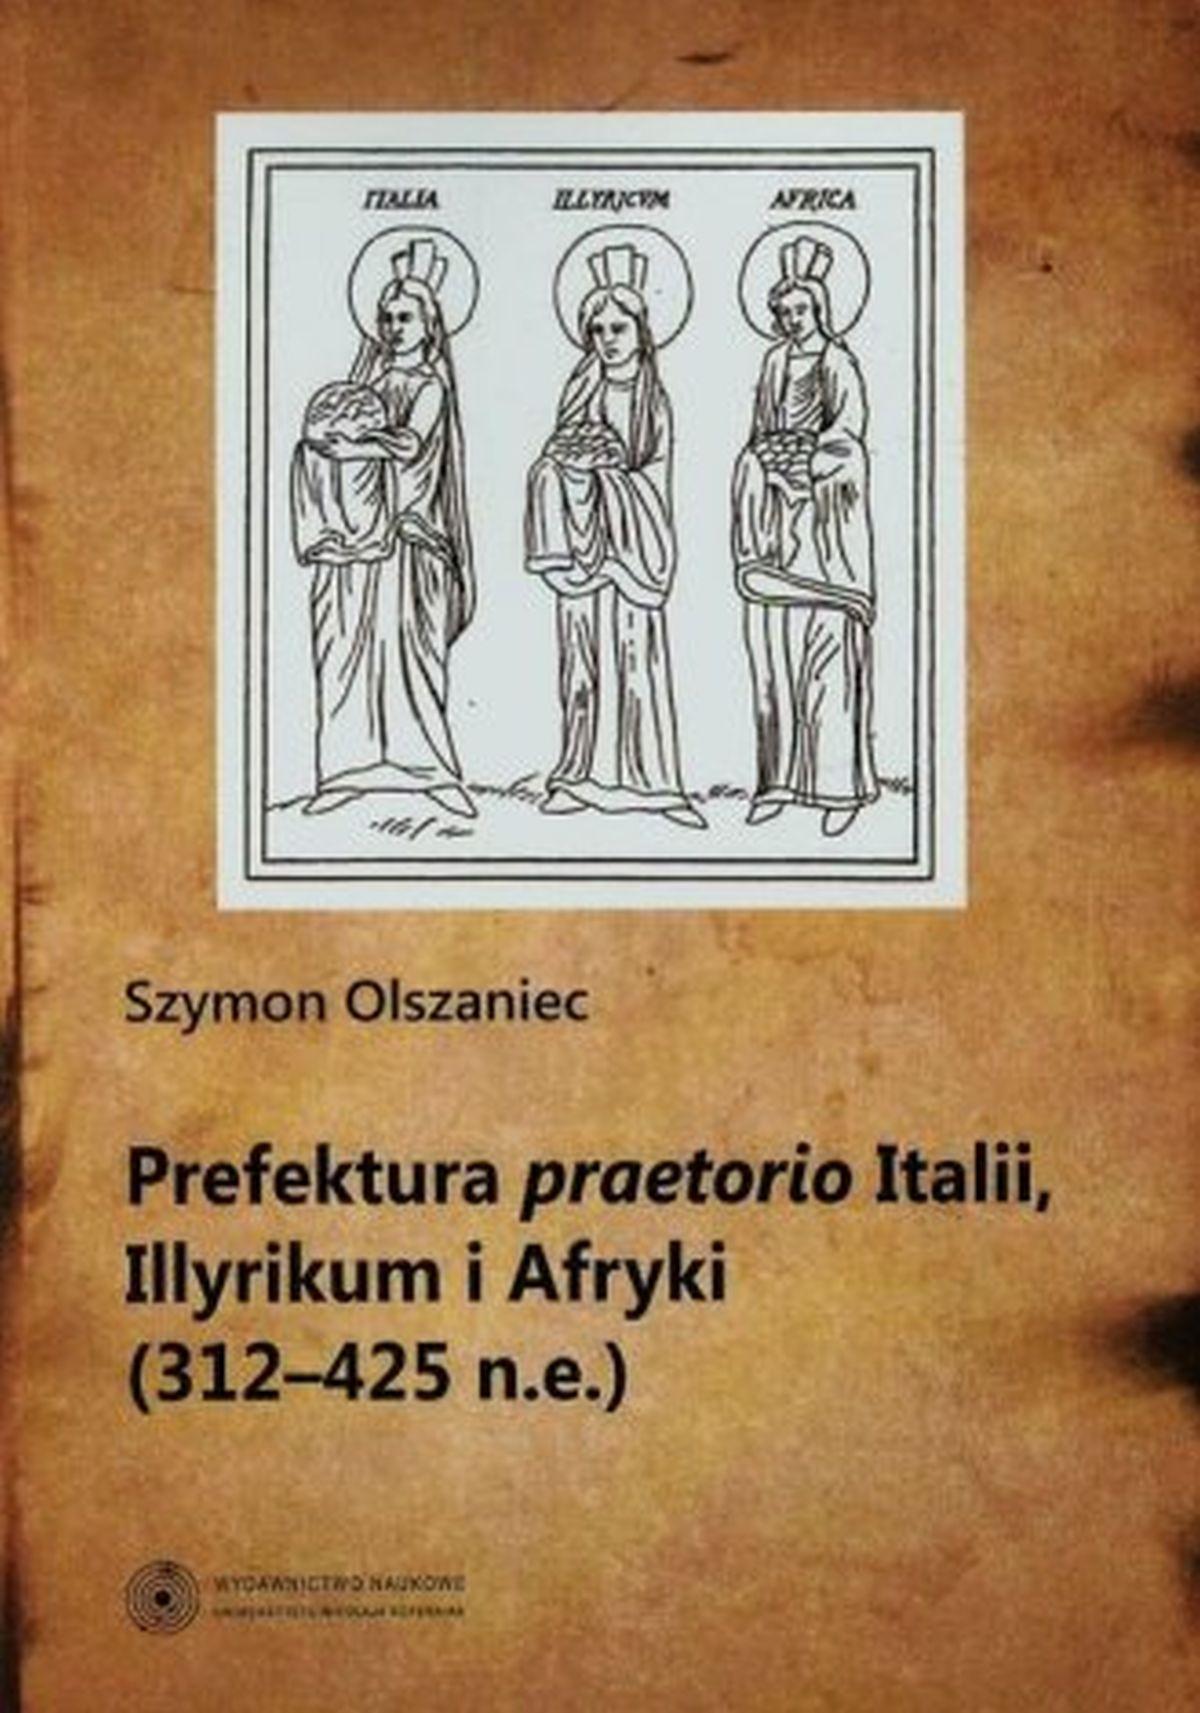 Prefektura praetorio Italii Illyrikum i Afryki (312-425 n.e.)